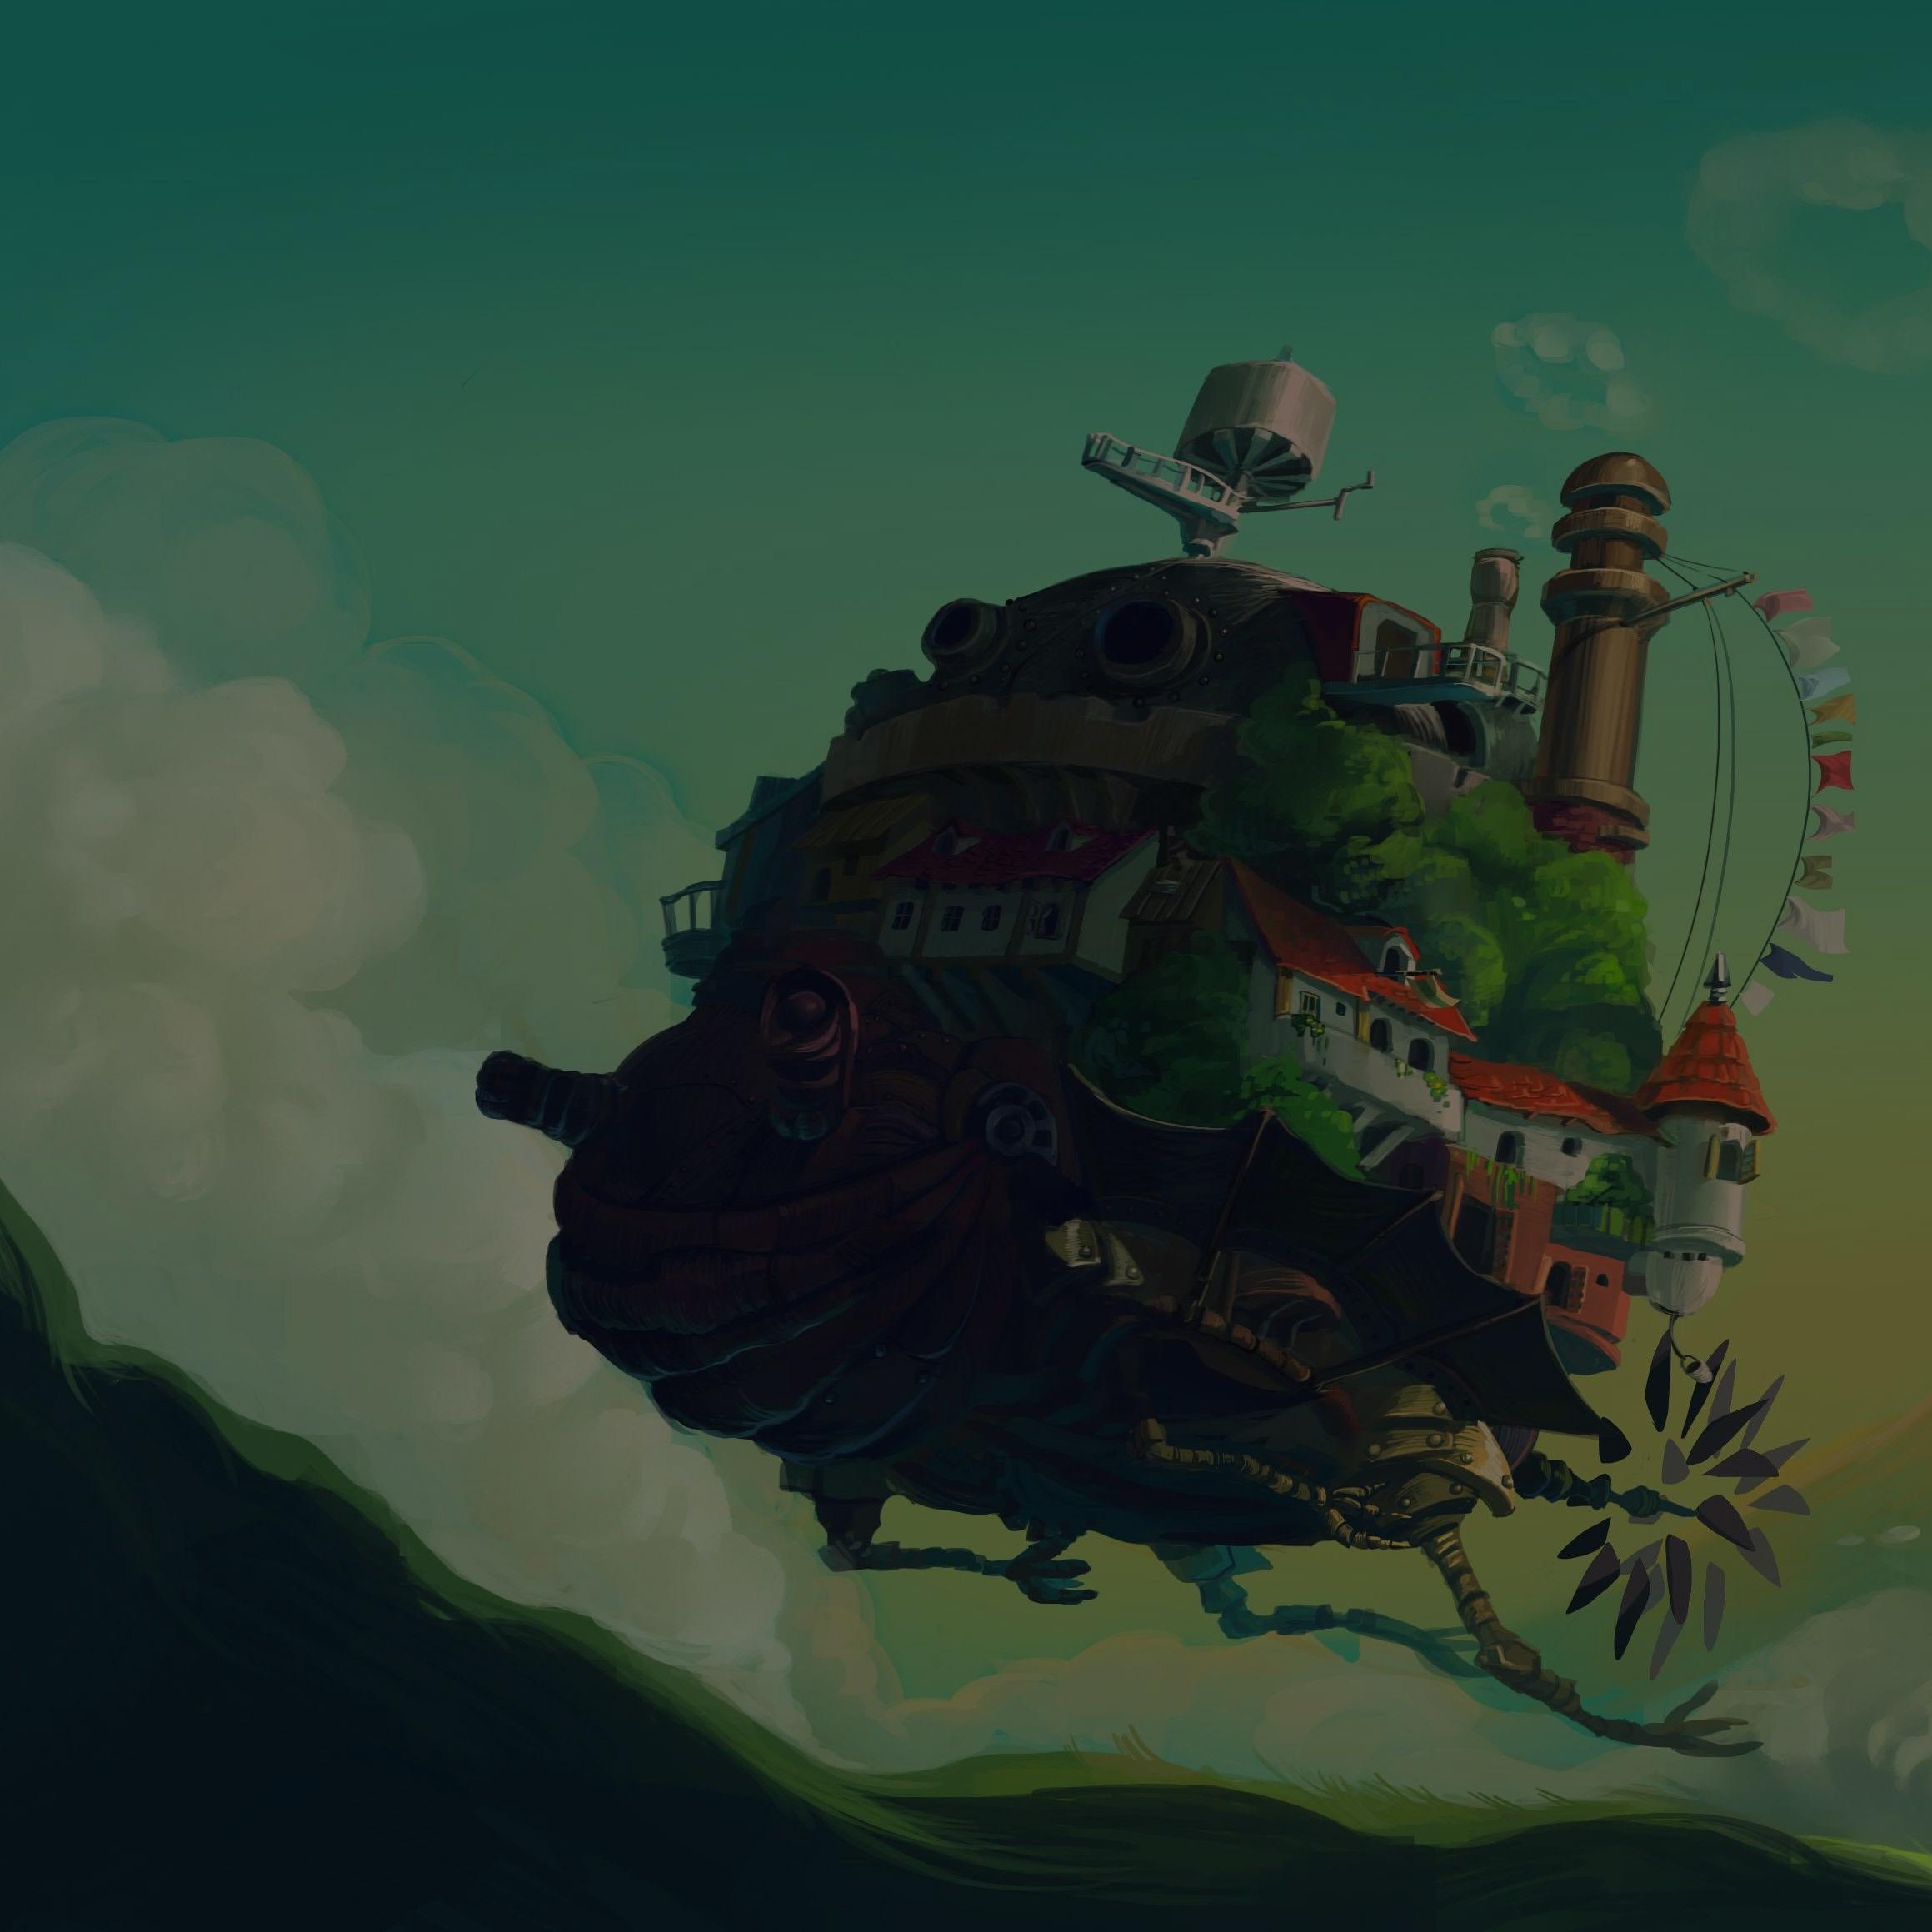 Studio Ghibli & Hayao Miyazaki